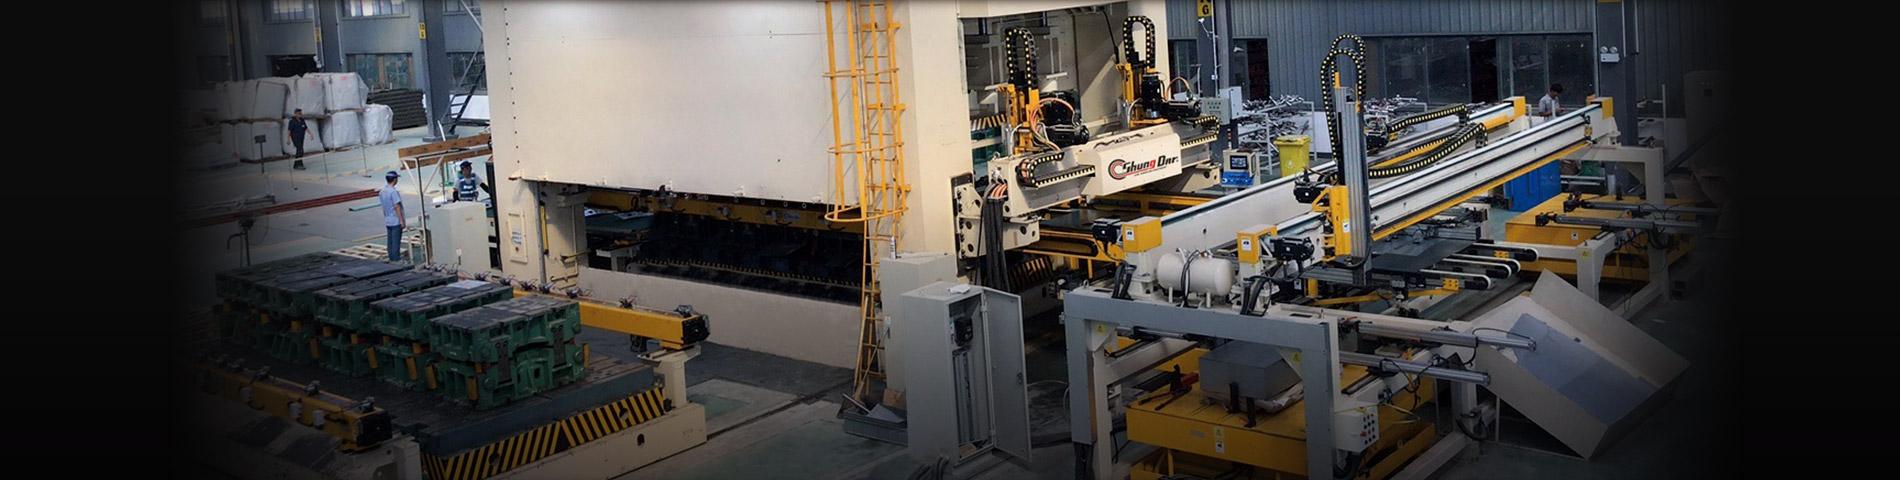 Press Transfer Robot System Press